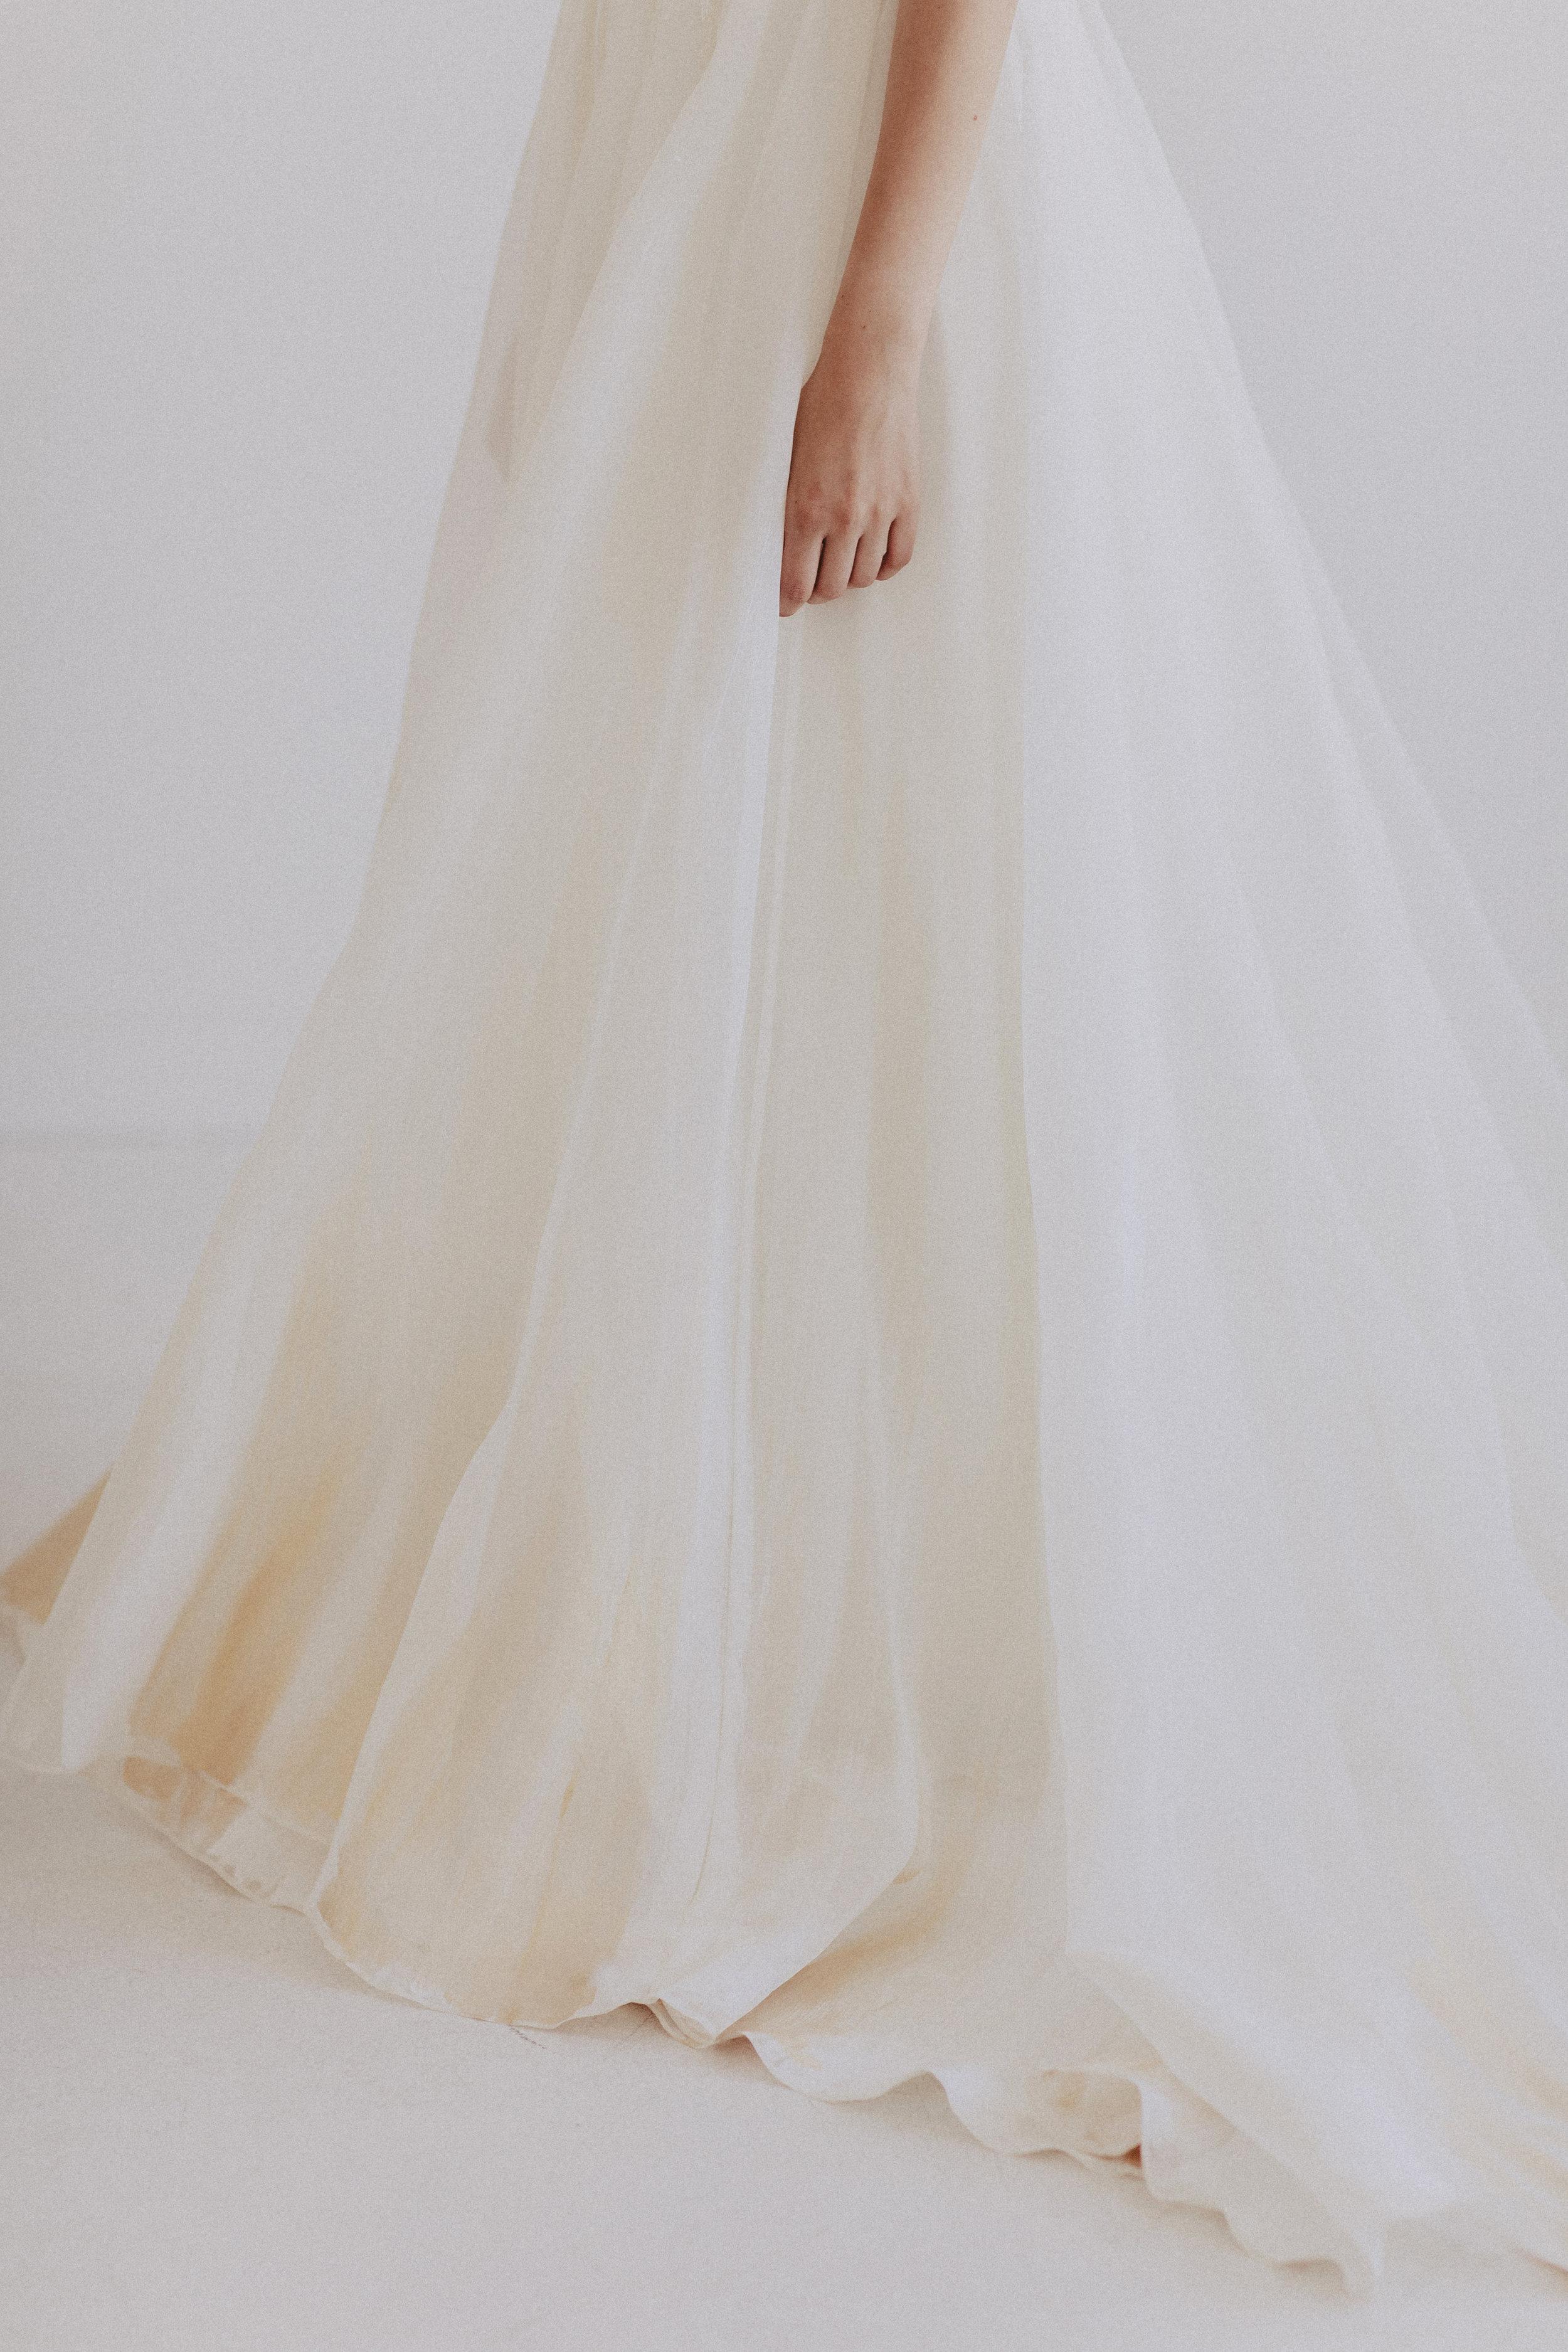 Dolly by Chantel Lauren hand painted organza silk wedding gown